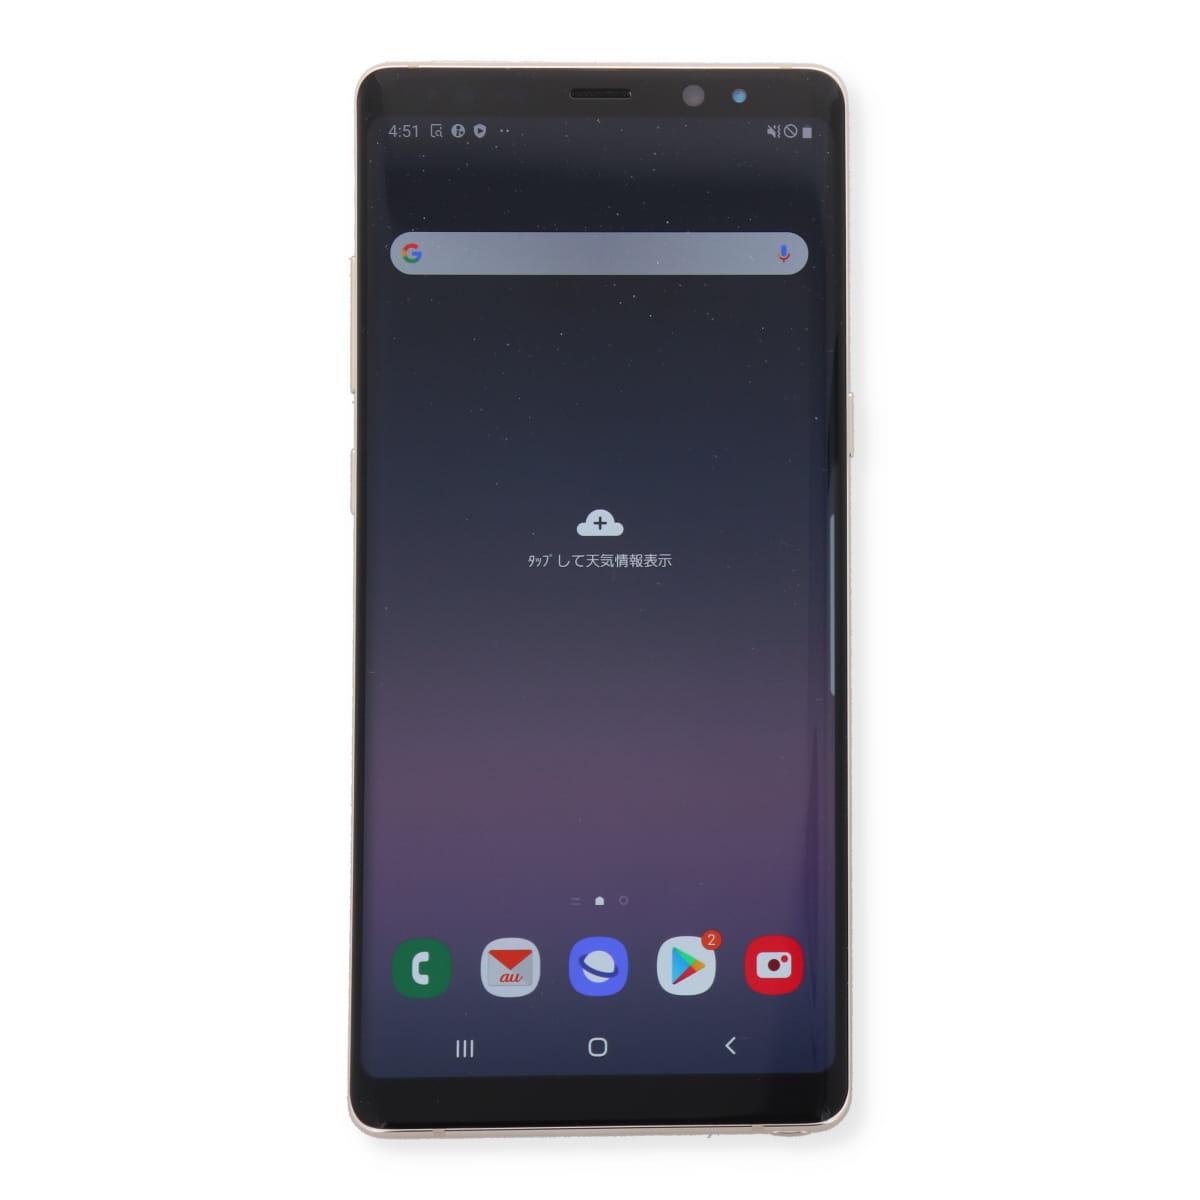 <title>Galaxy Note 8 au 64GB 安値 Samsung 中古 ネットワーク利用制限保証 送料無料 1ヵ月保証 SCV37 Cランク スマホ スマートフォン 本体 端末 保証付き</title>